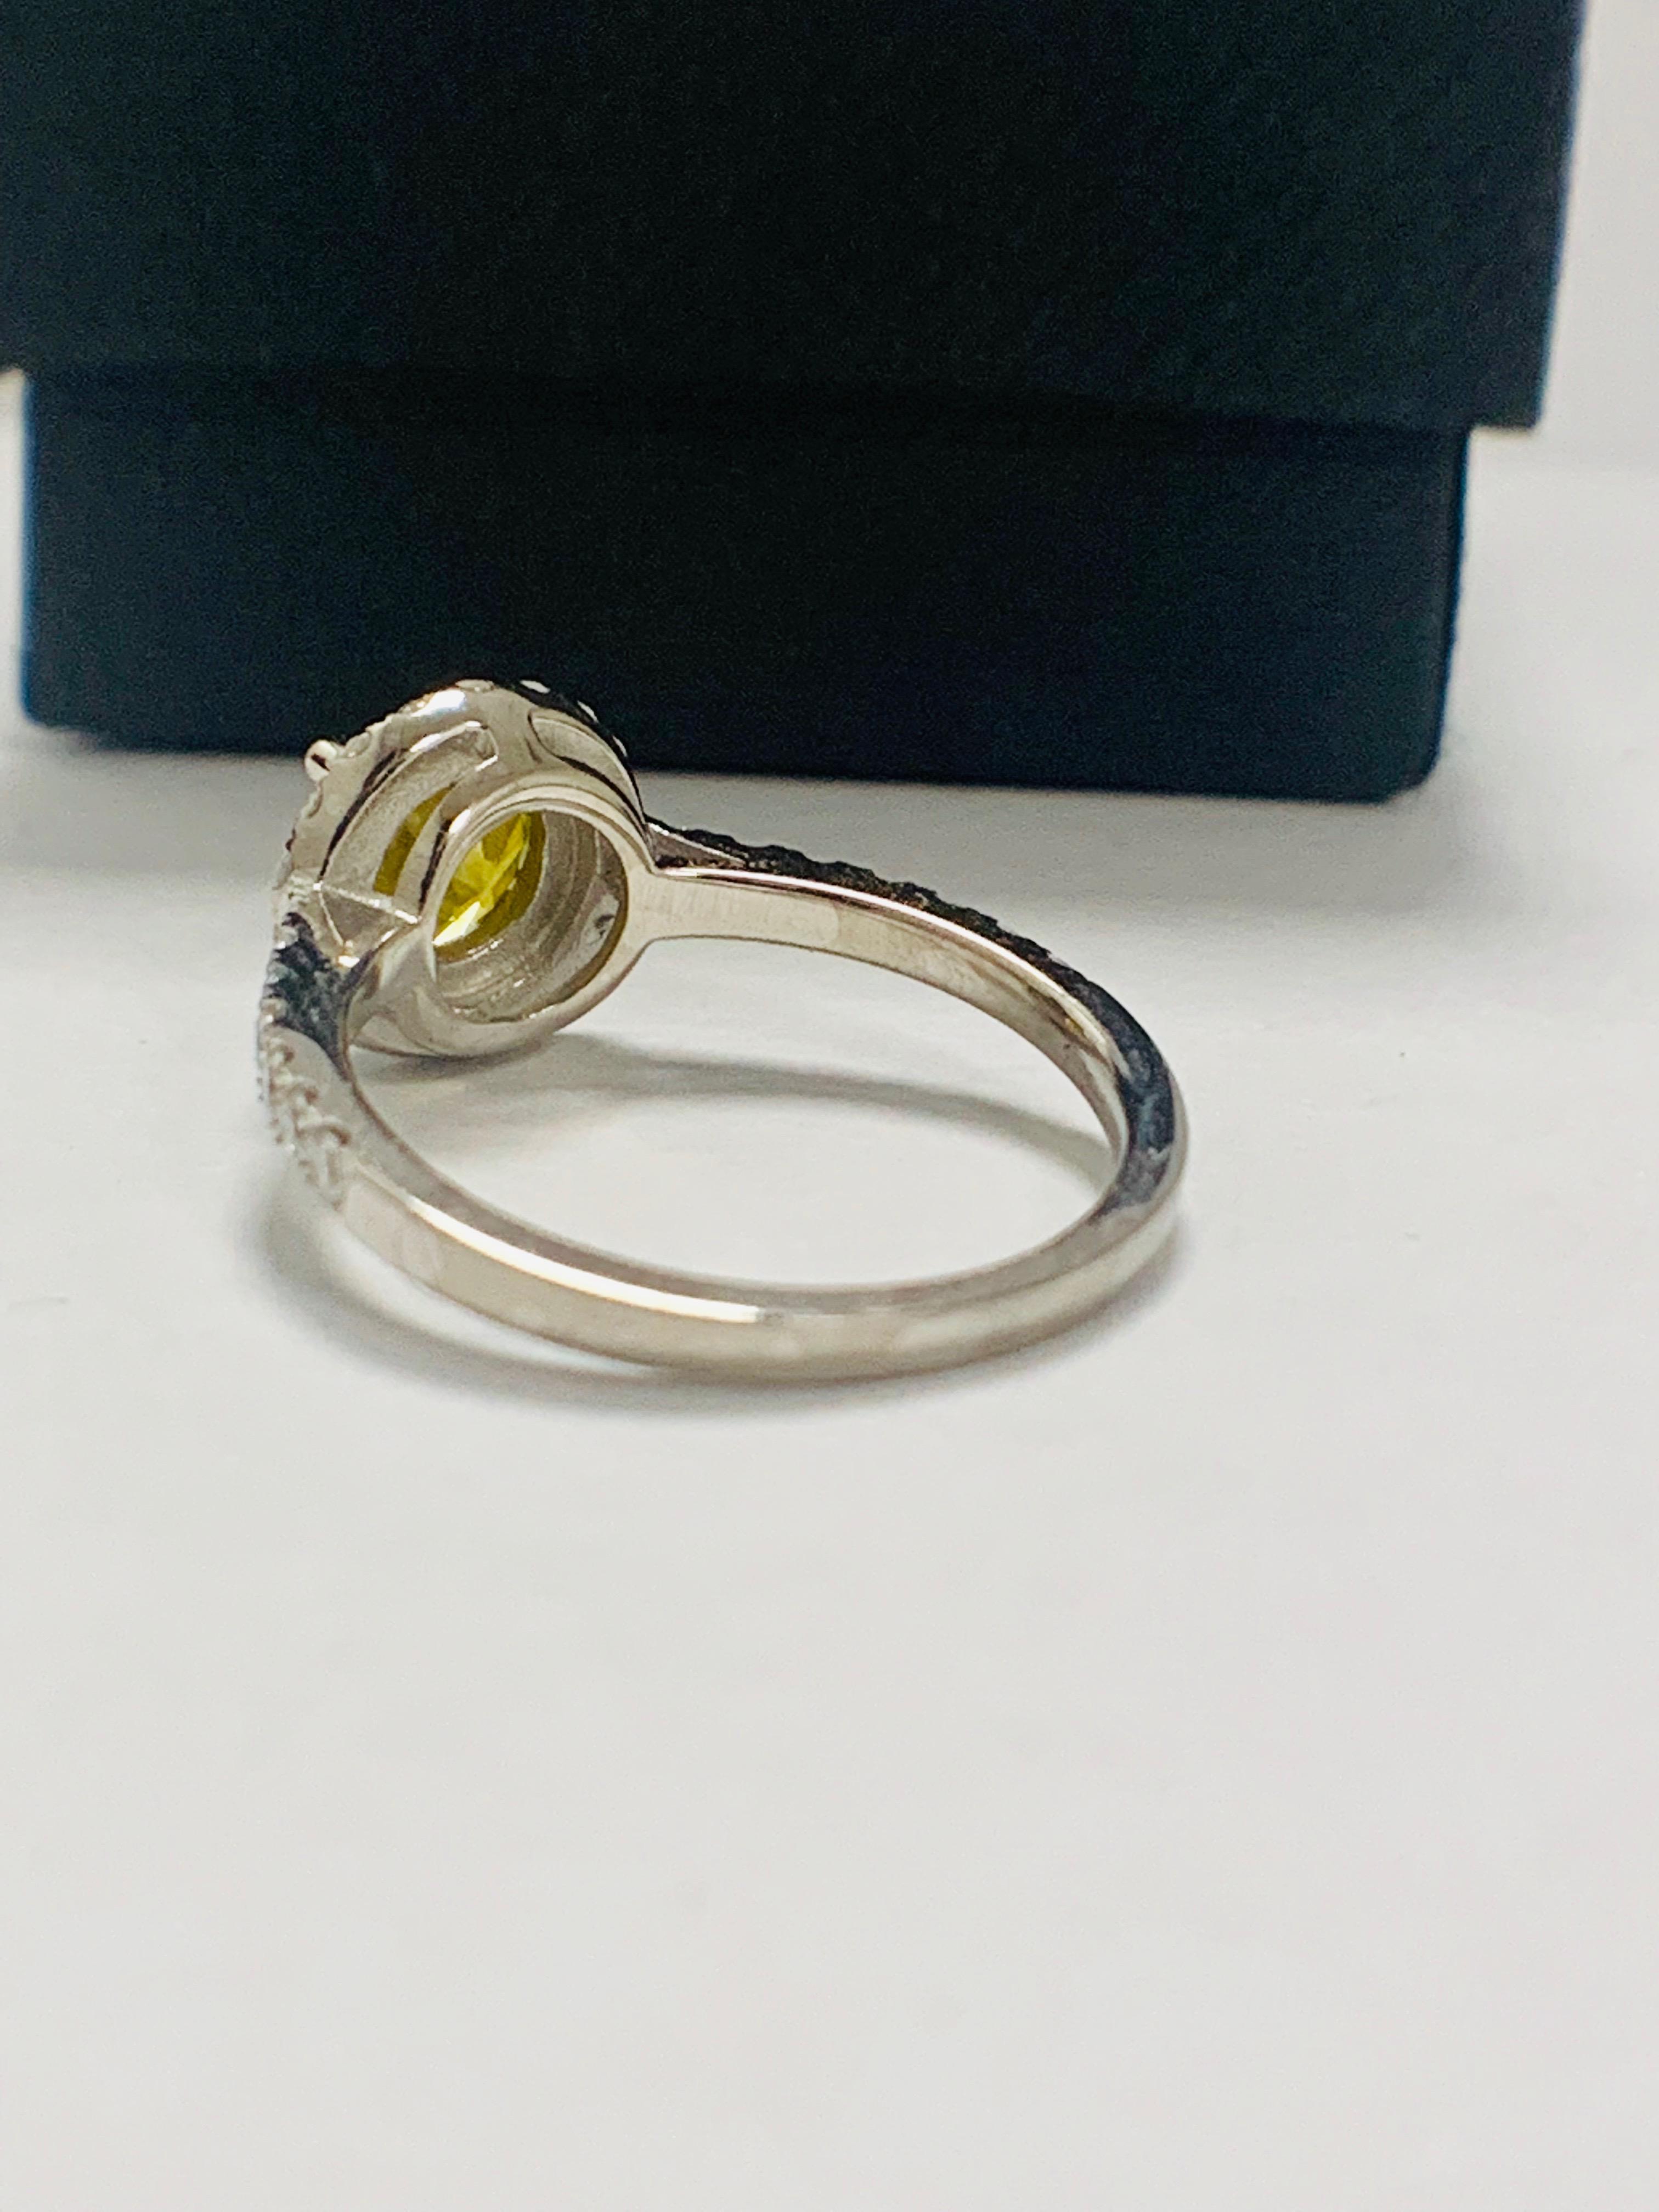 14ct White Gold Diamond ring featuring centre, round brilliant cut, yellow Diamond (1.08ct) - Image 5 of 12